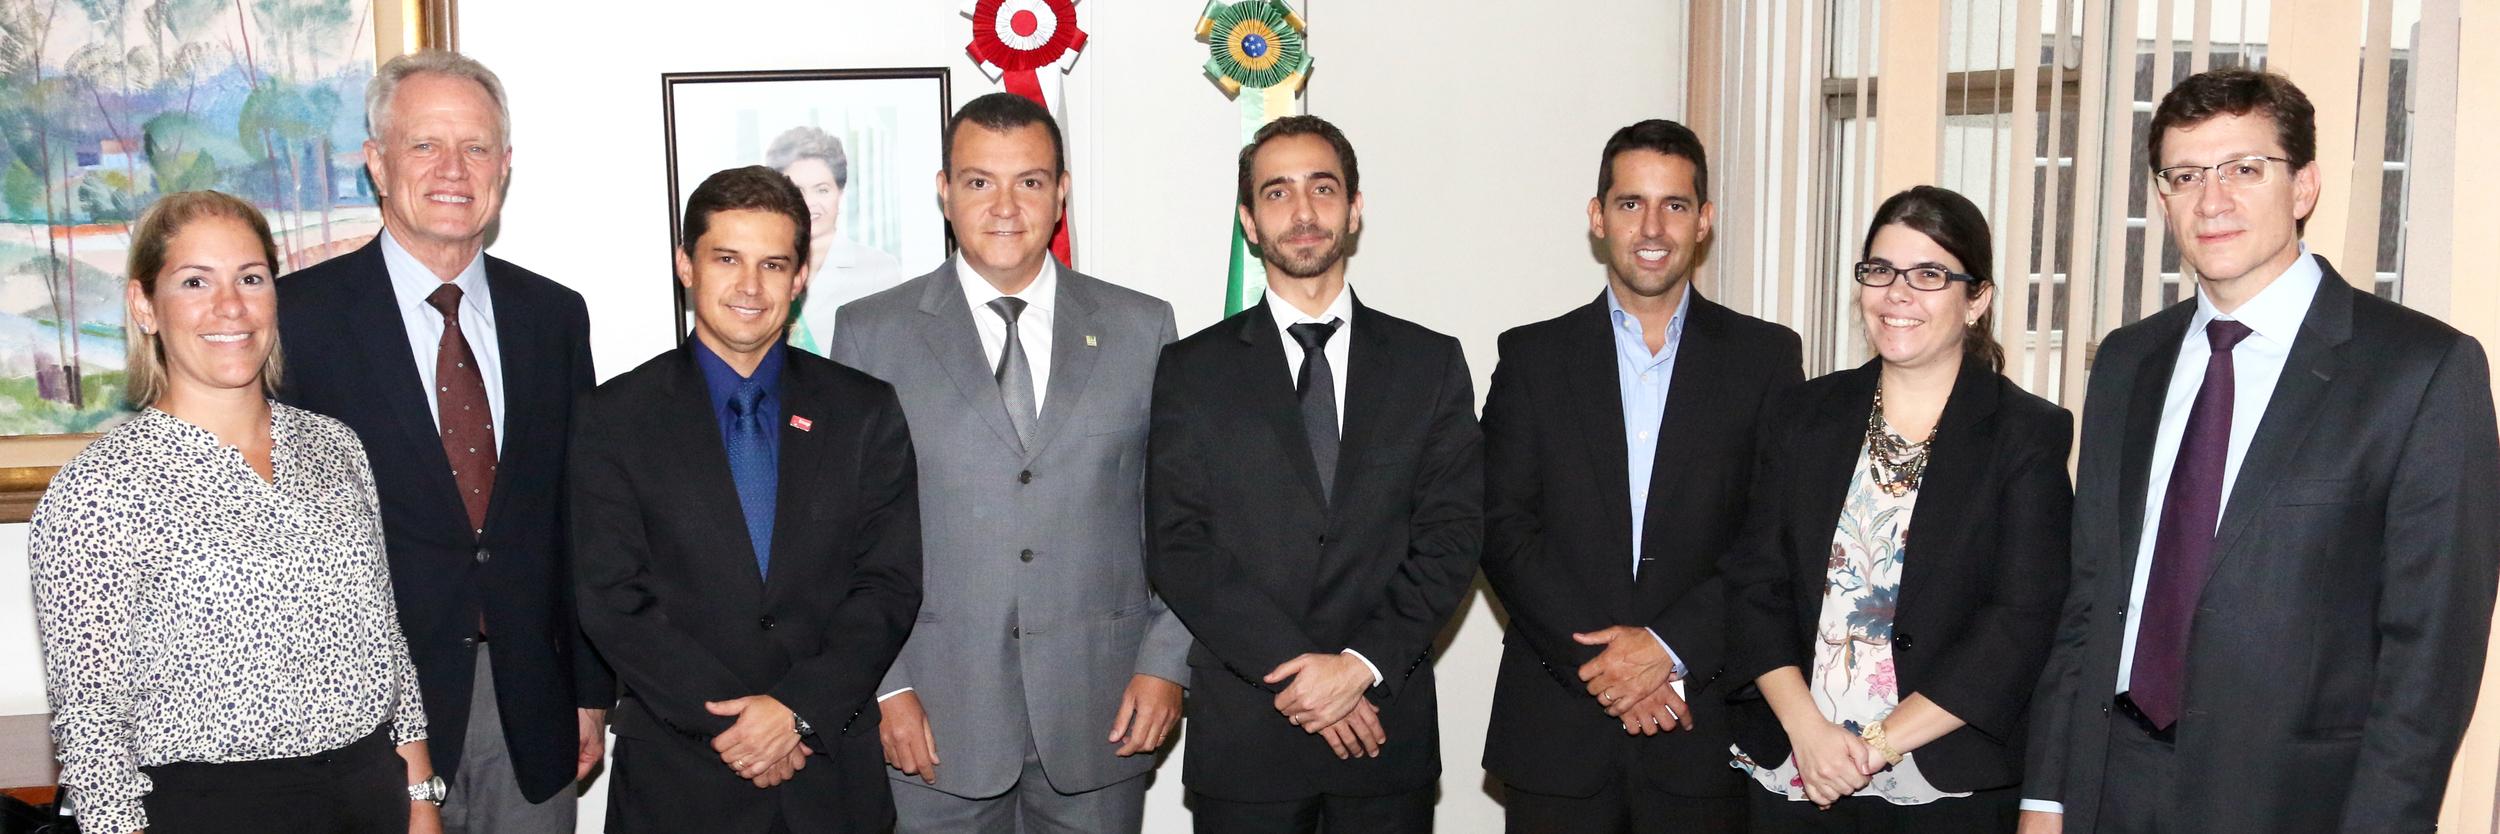 Maria Luiza Paranhos, Thomas Trebat, Gleisson Rubin, João Aurélio, Matheus Azevedo, Pedro Cavalcante, Aline Soares e Luiz Henrique D'Andrea